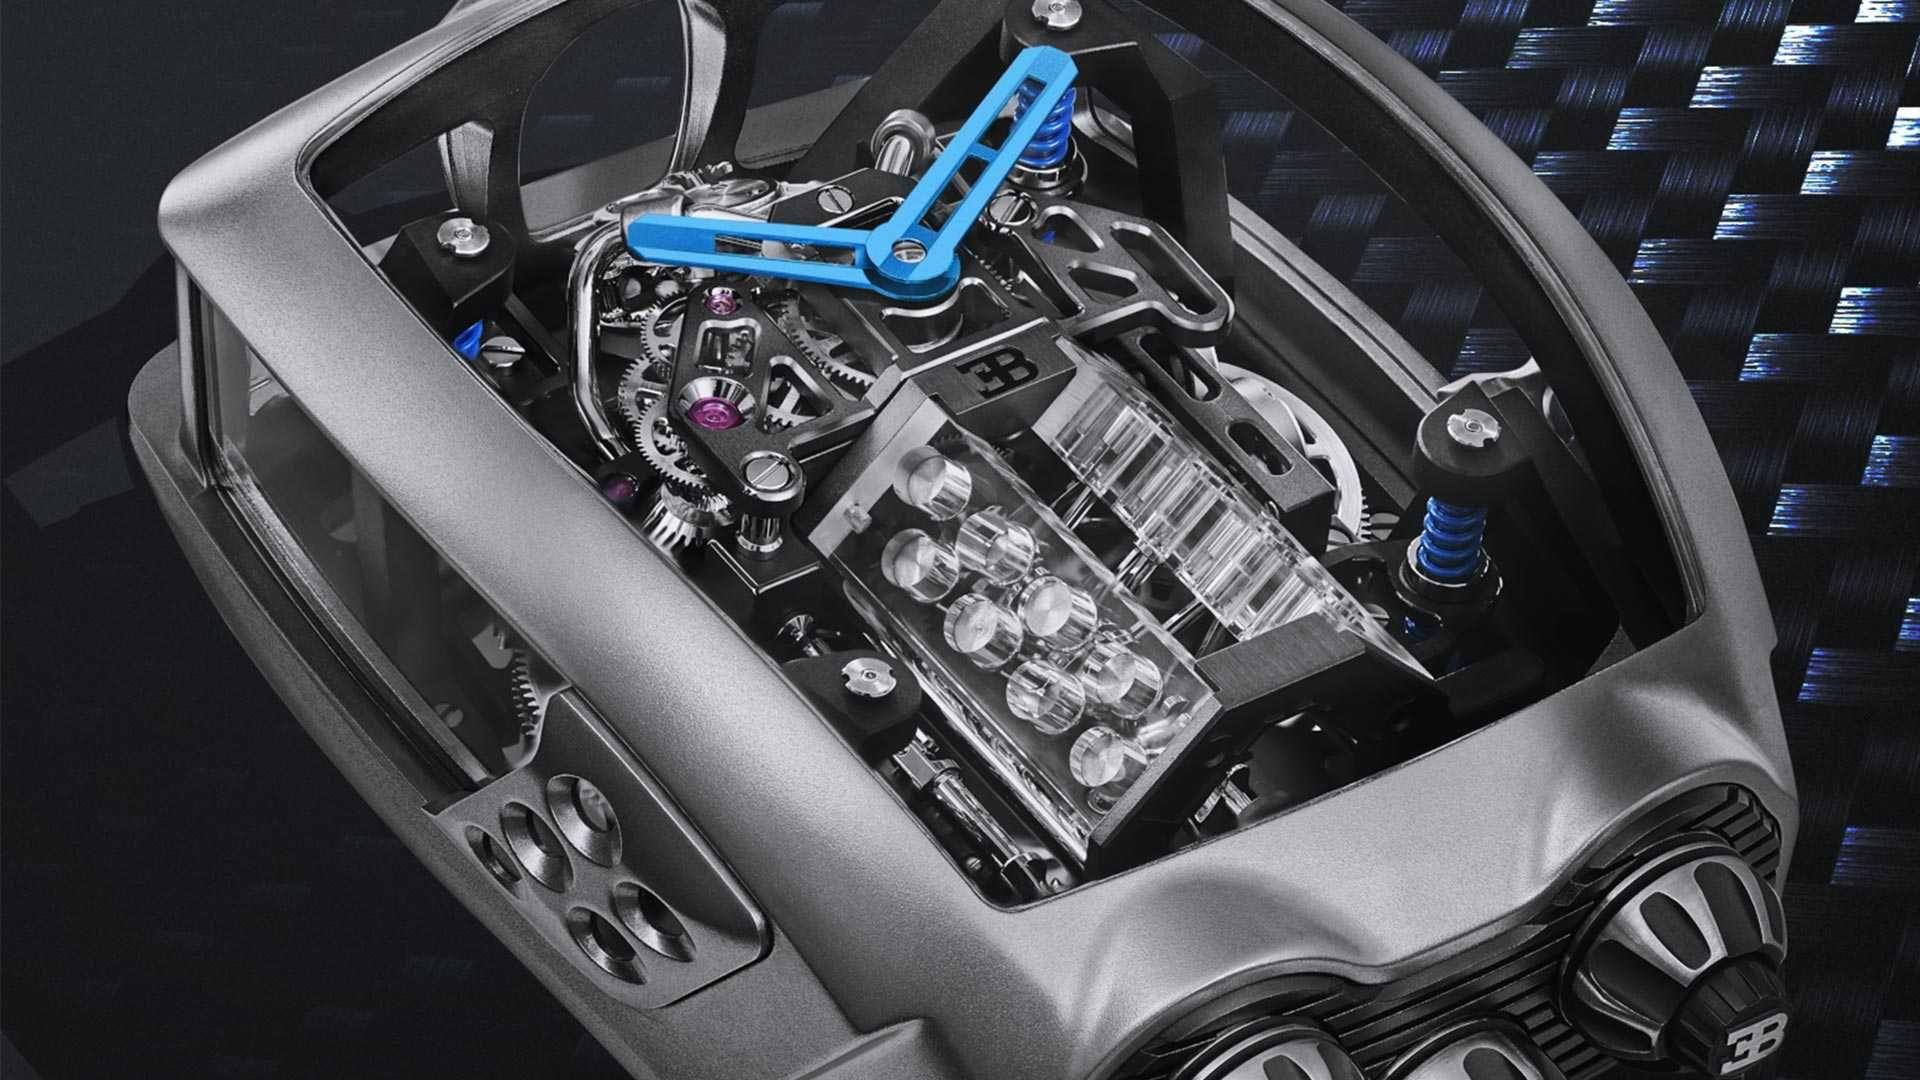 Итоги продаж в РК, юбилеи Veyron, RAV4 и Jimny 278494 - Kapital.kz